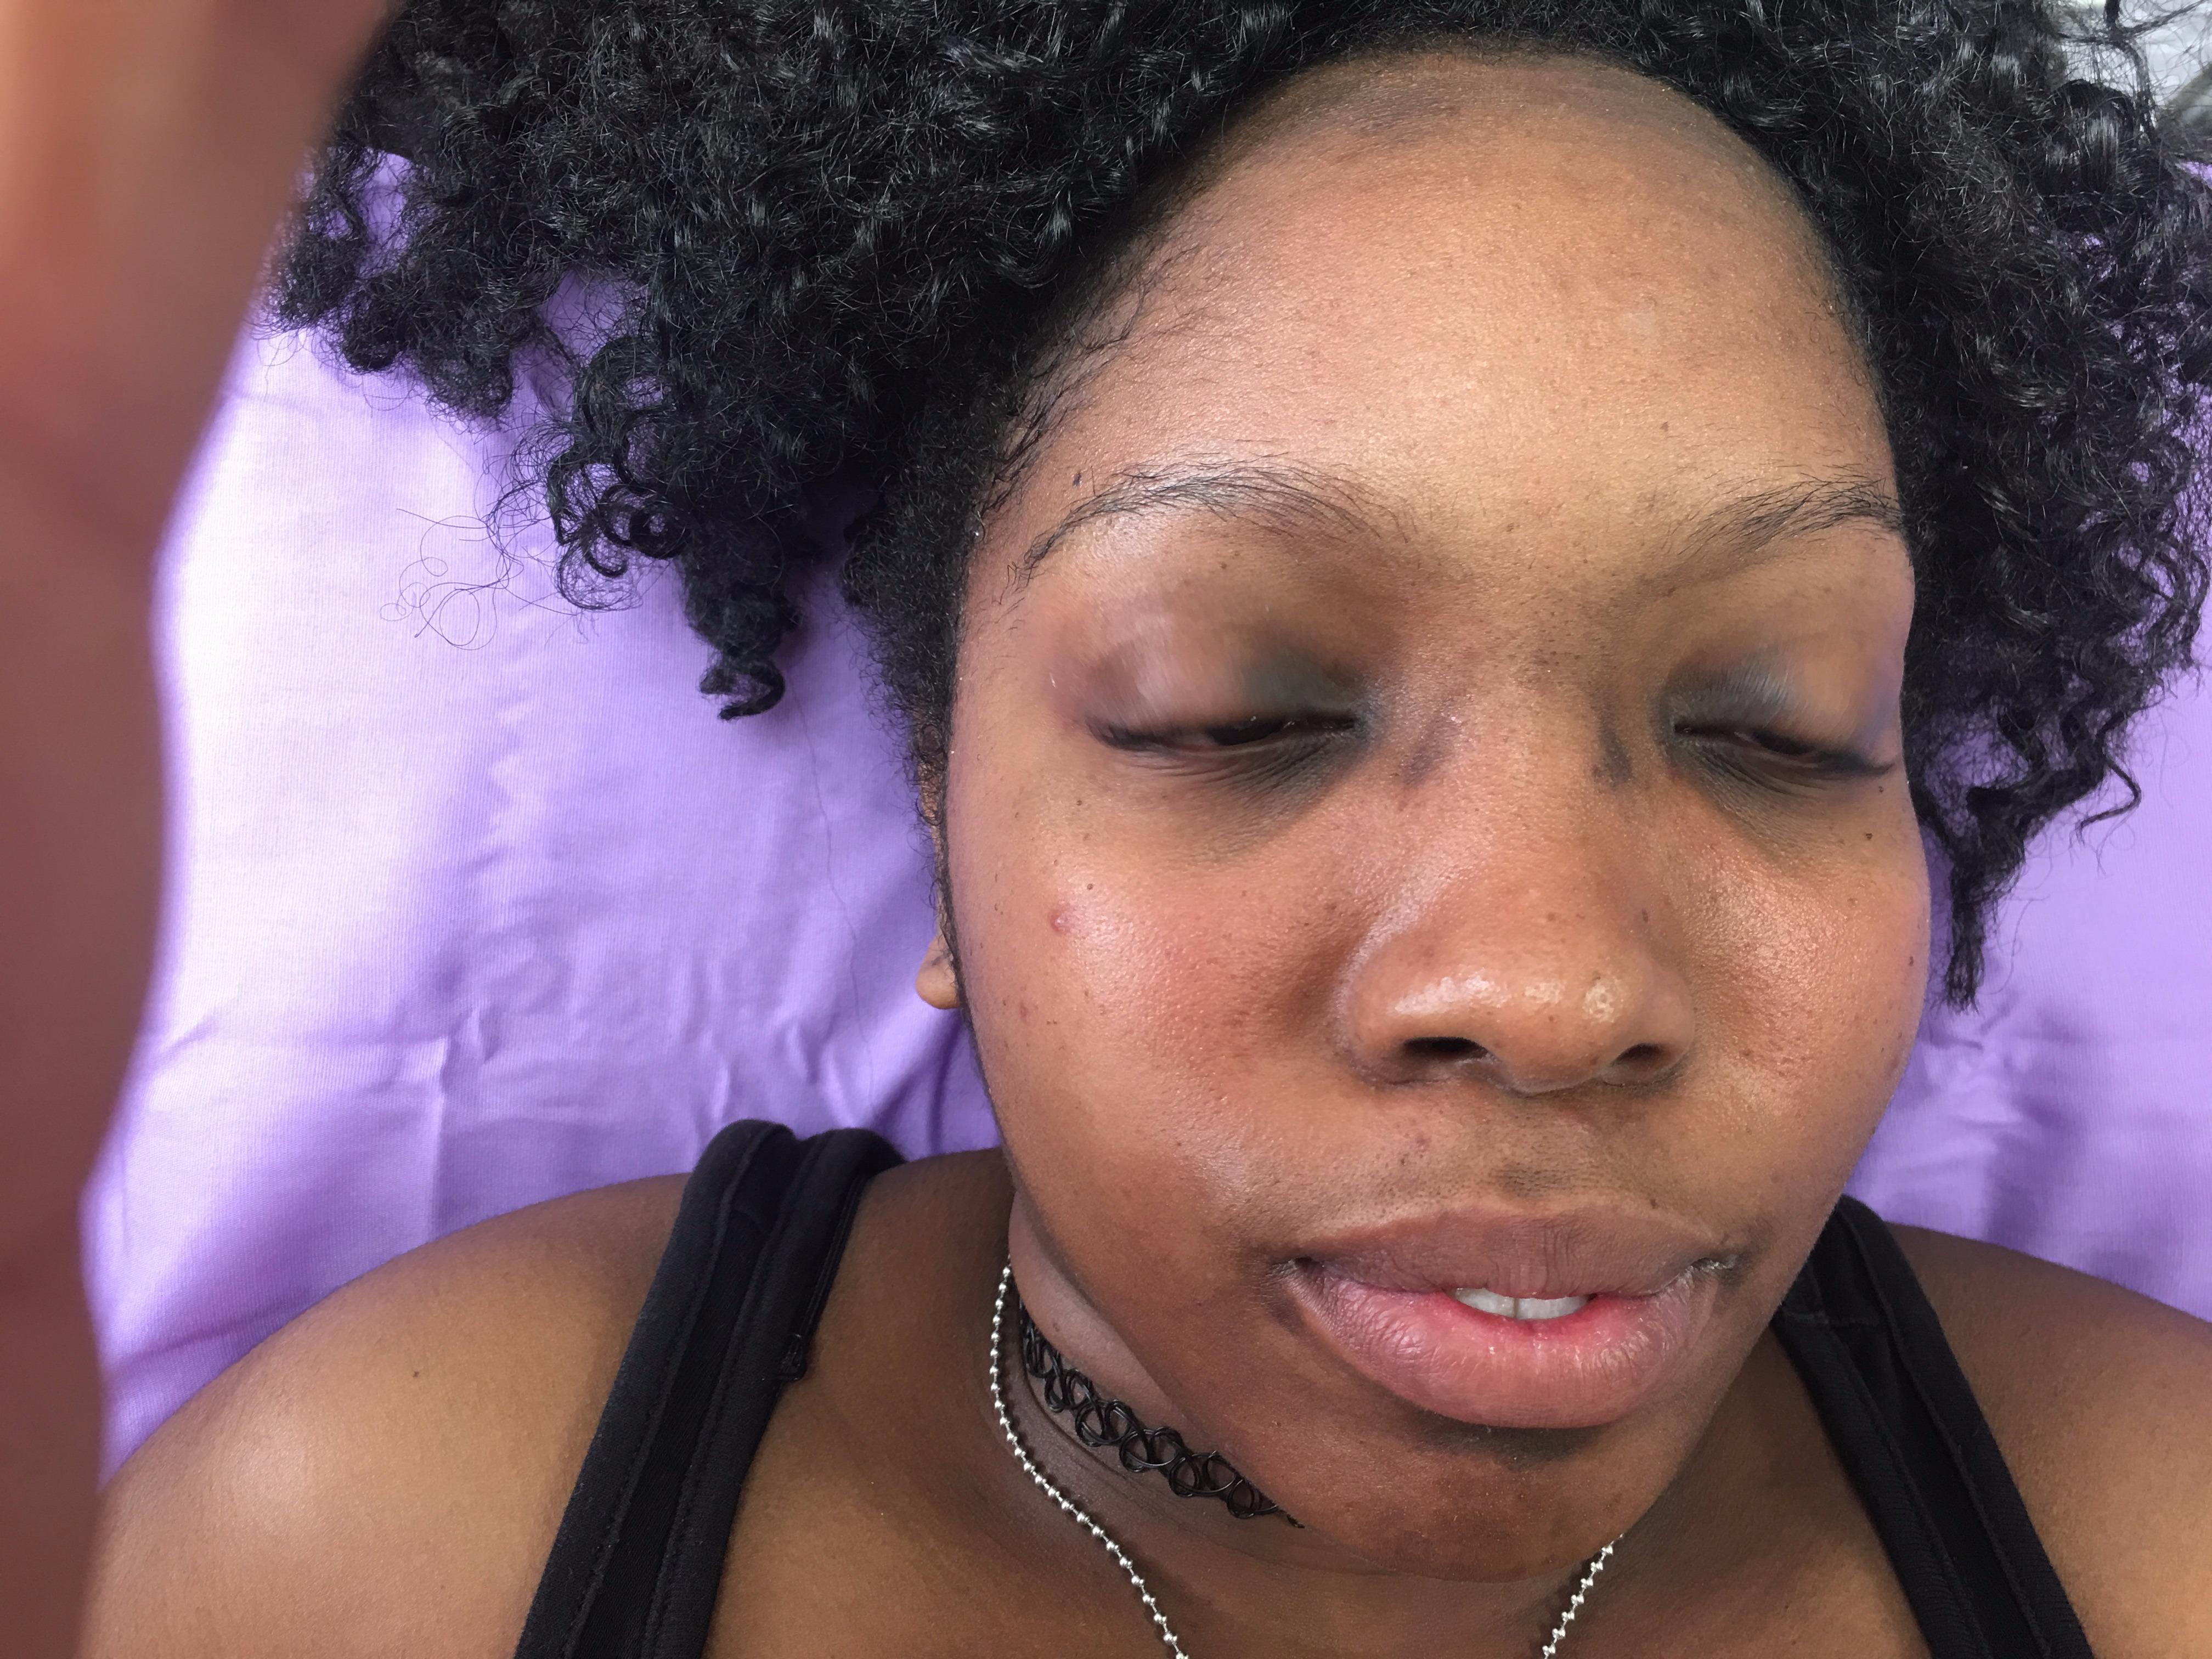 Blink Permanent Cosmetics image 2